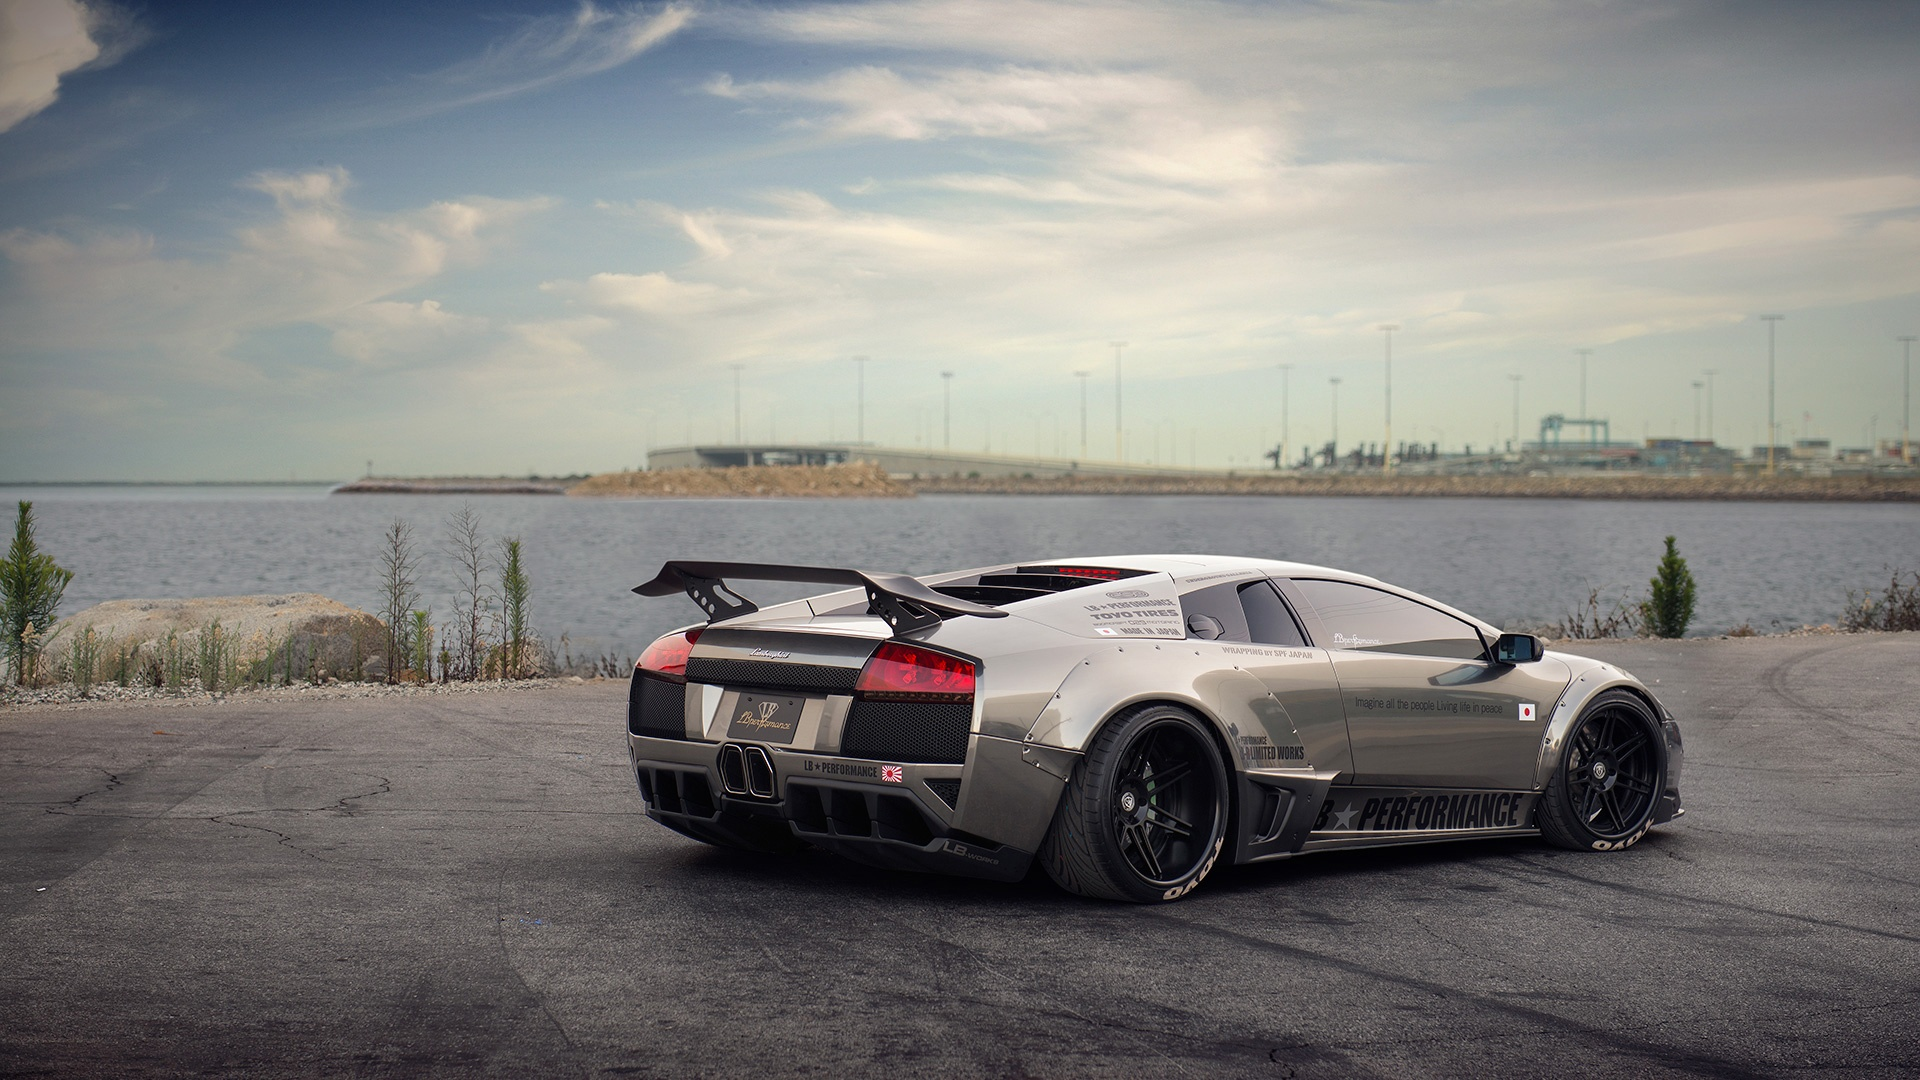 car 4k wallpaper,land vehicle,vehicle,car,automotive design,supercar